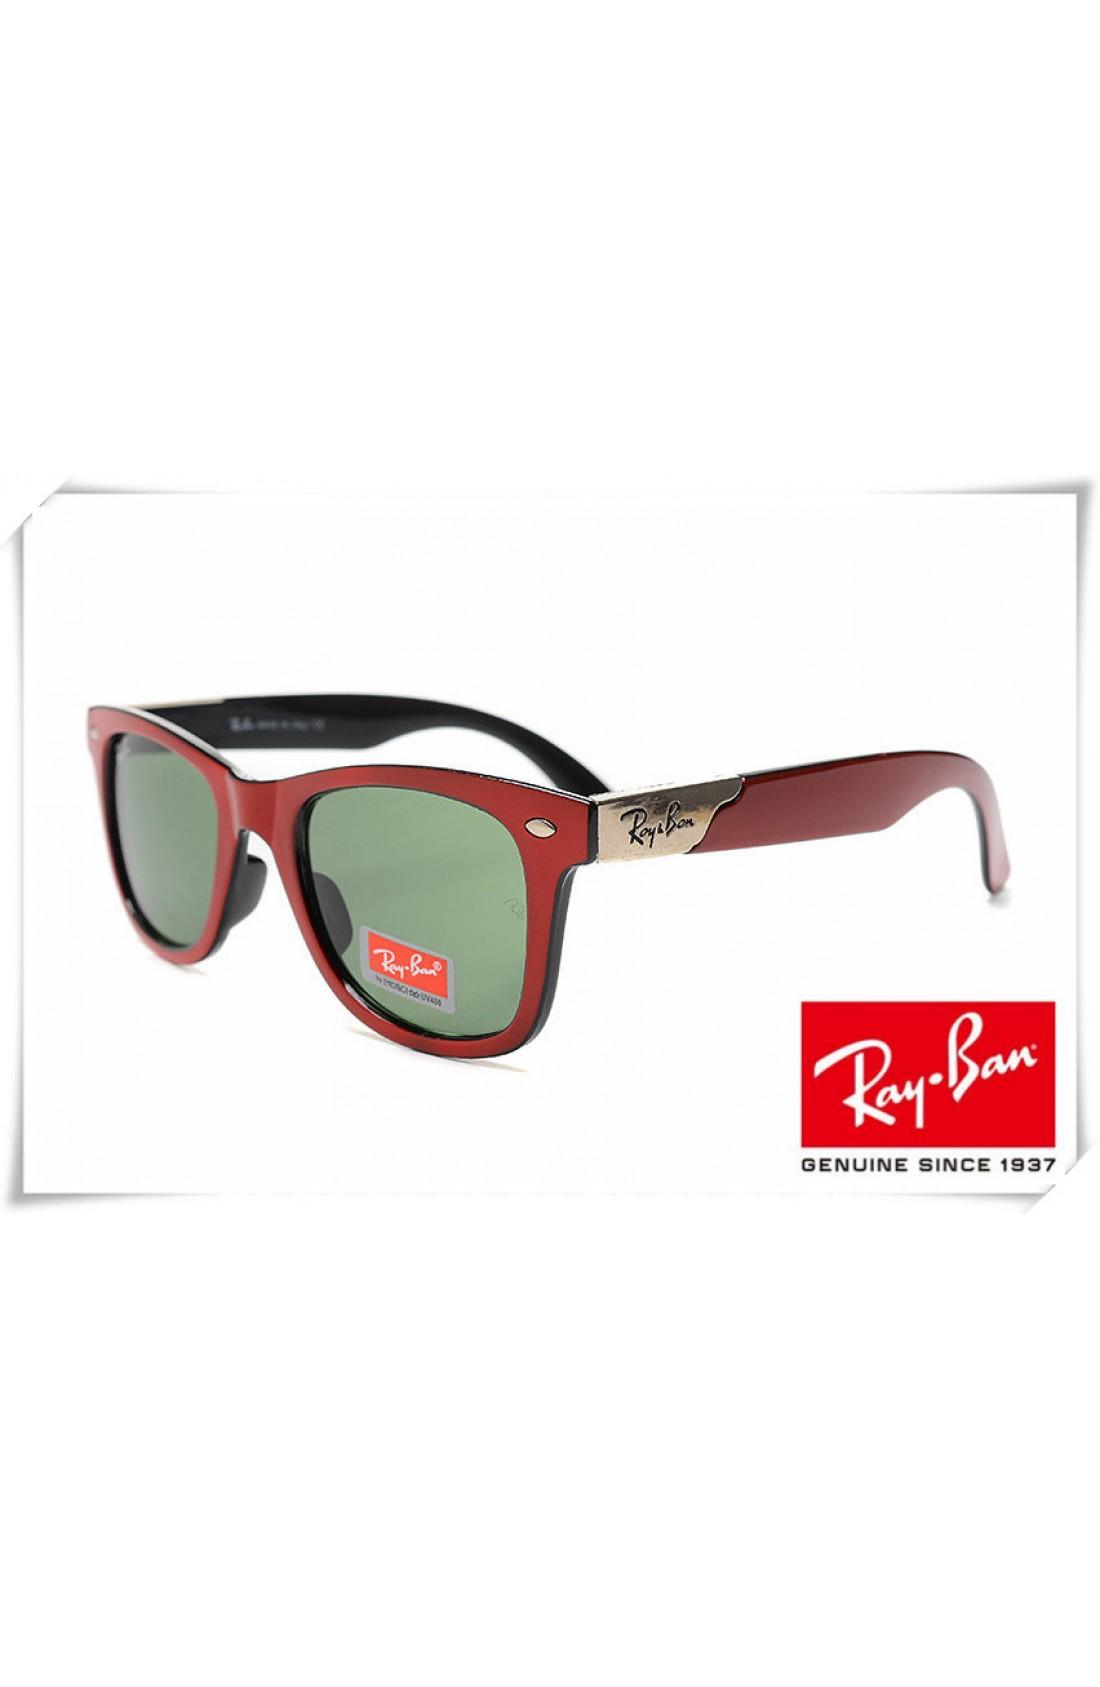 Ray Ban Eyeglasses Red Inside Heritage Malta